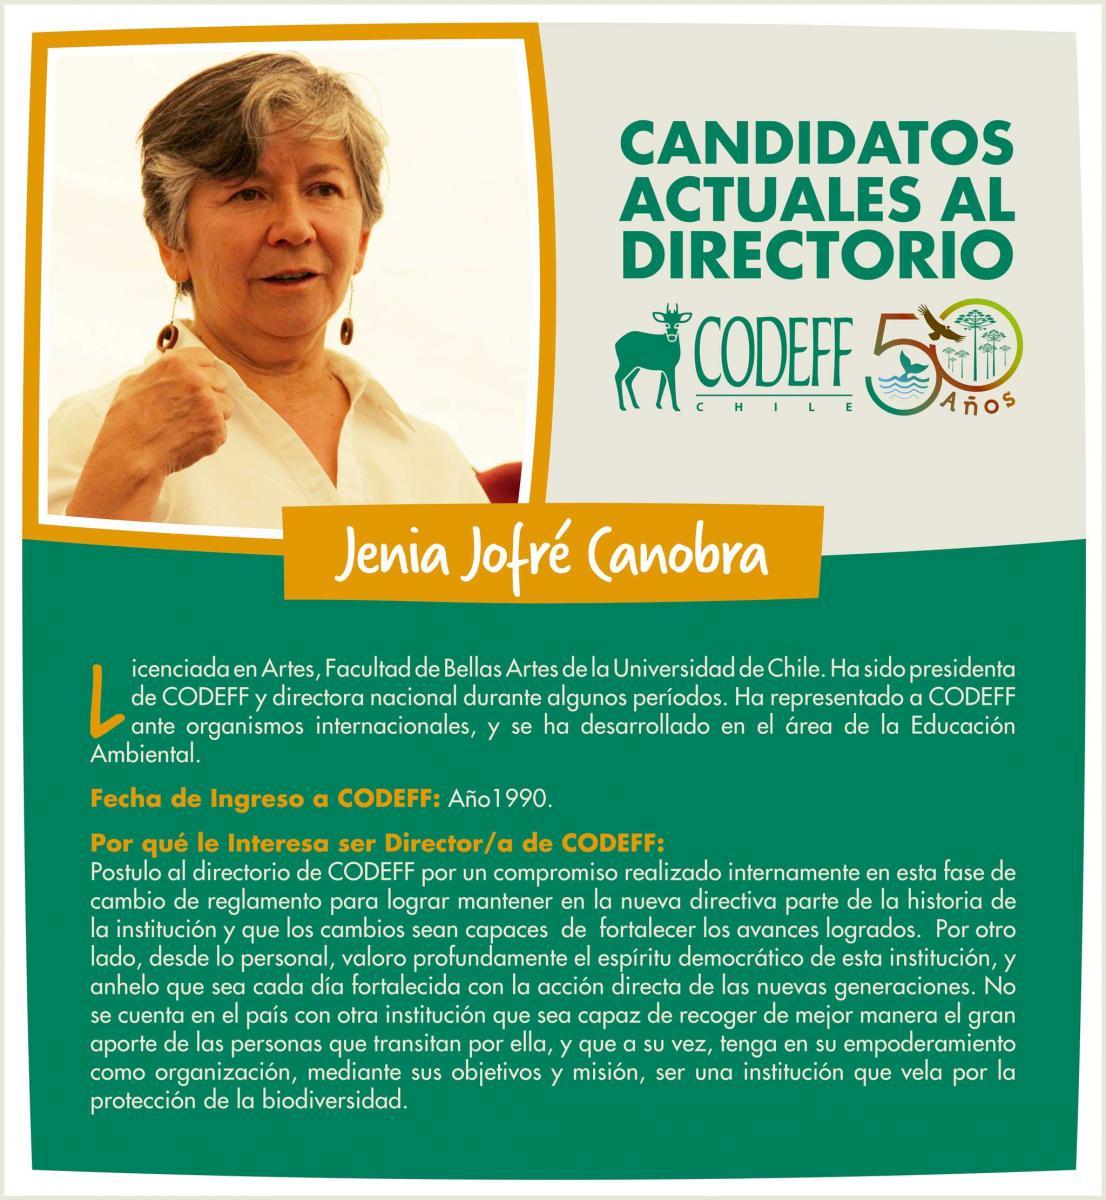 candidato_jenia_jofre_canobra